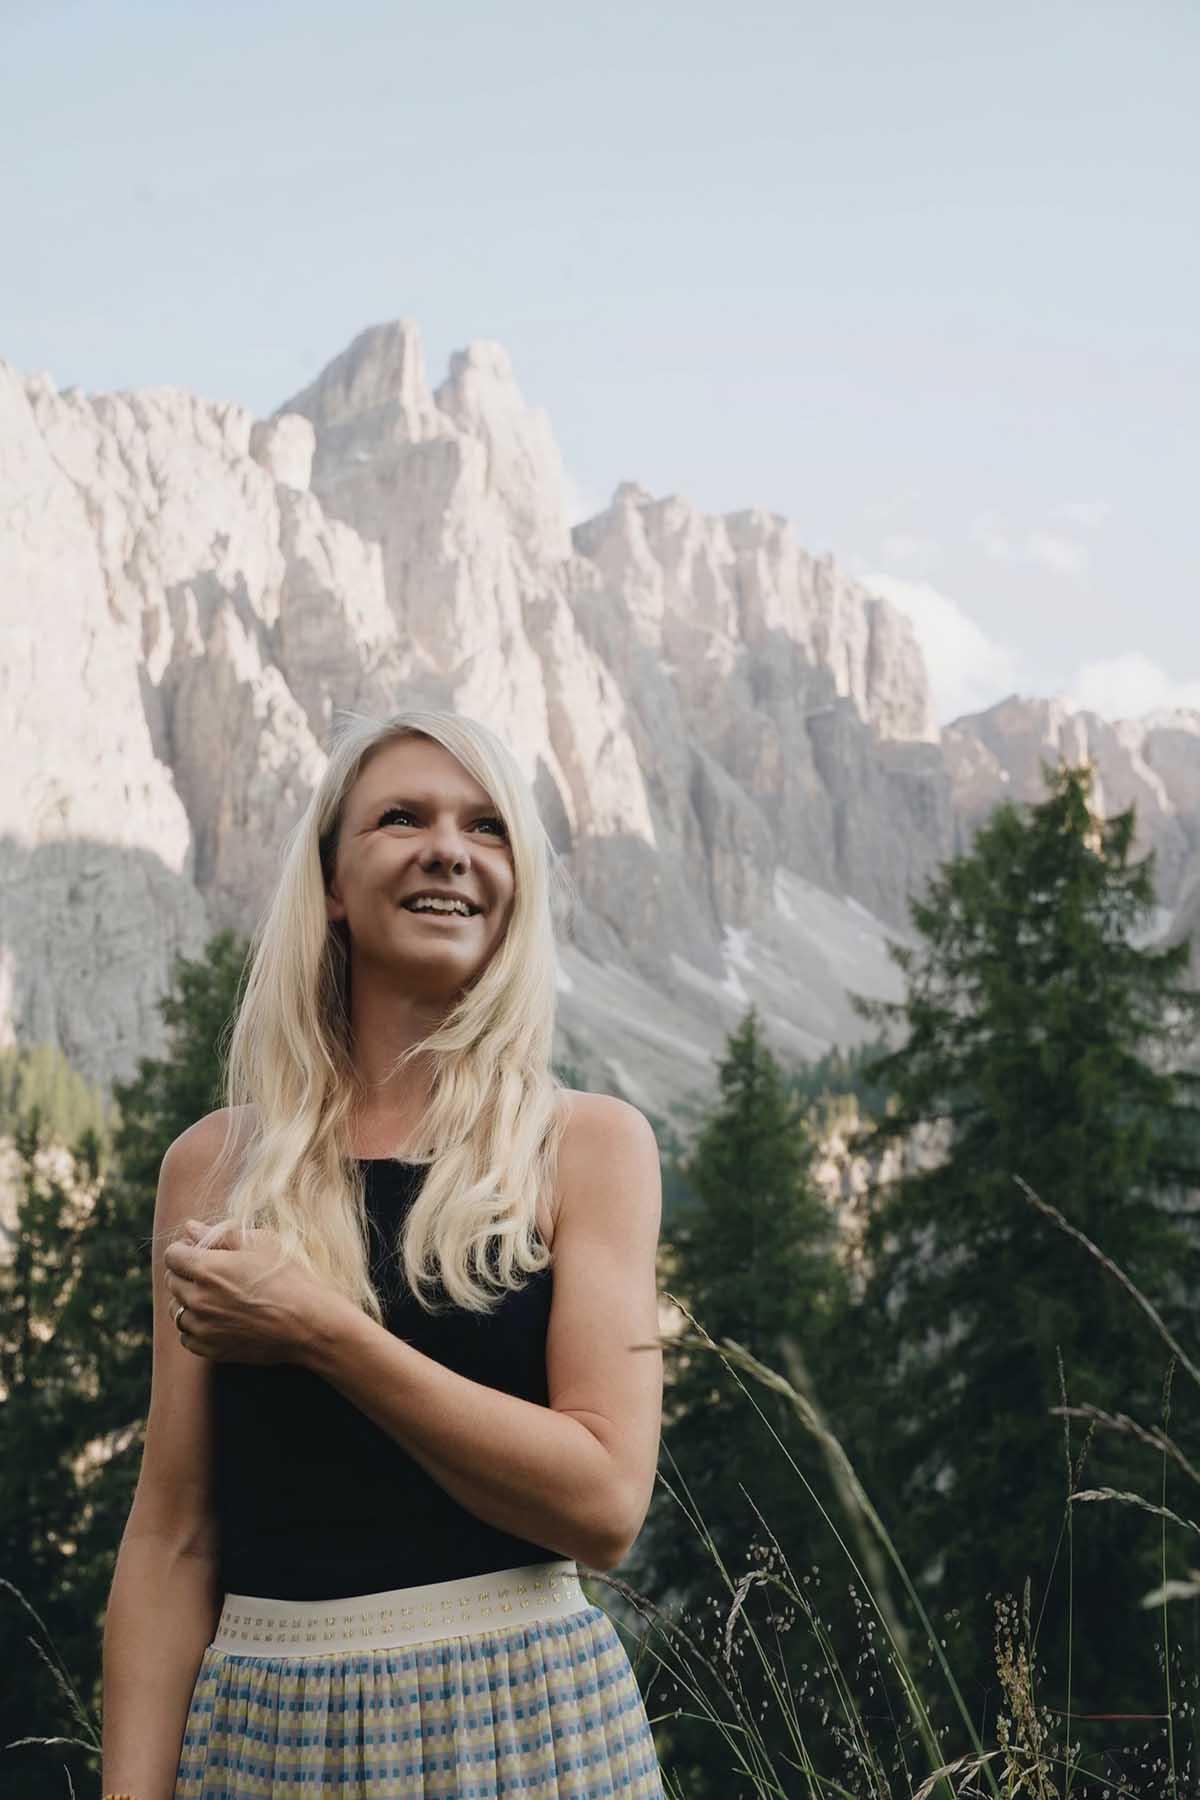 mountain-resort-kolfuschgerhof-dolomiten-frau-berge